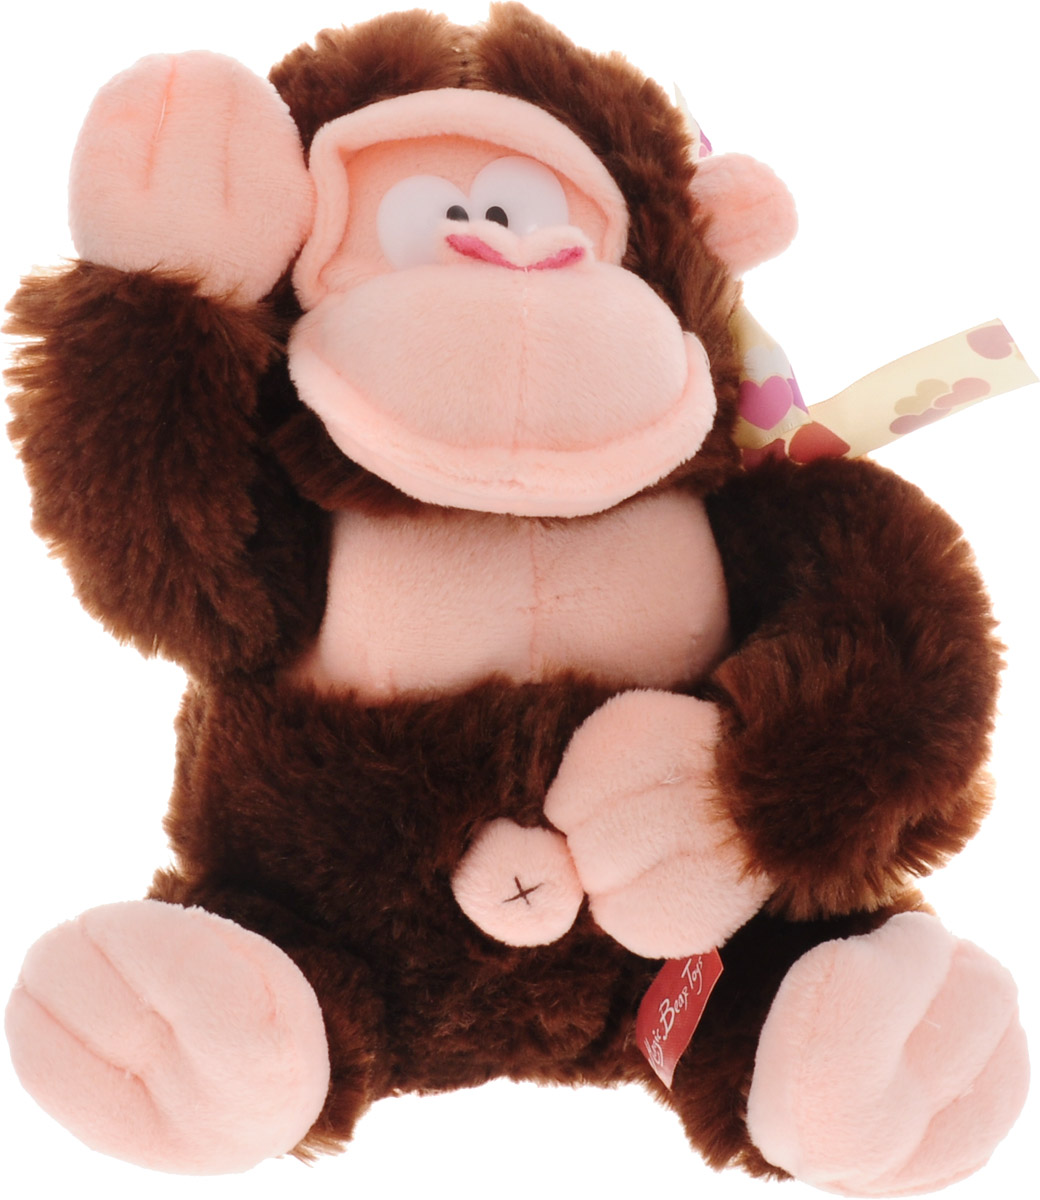 Magic Bear Toys Мягкая игрушка Обезьяна Федот цвет темно-коричневый 20 см фонокорректор coda 06x black